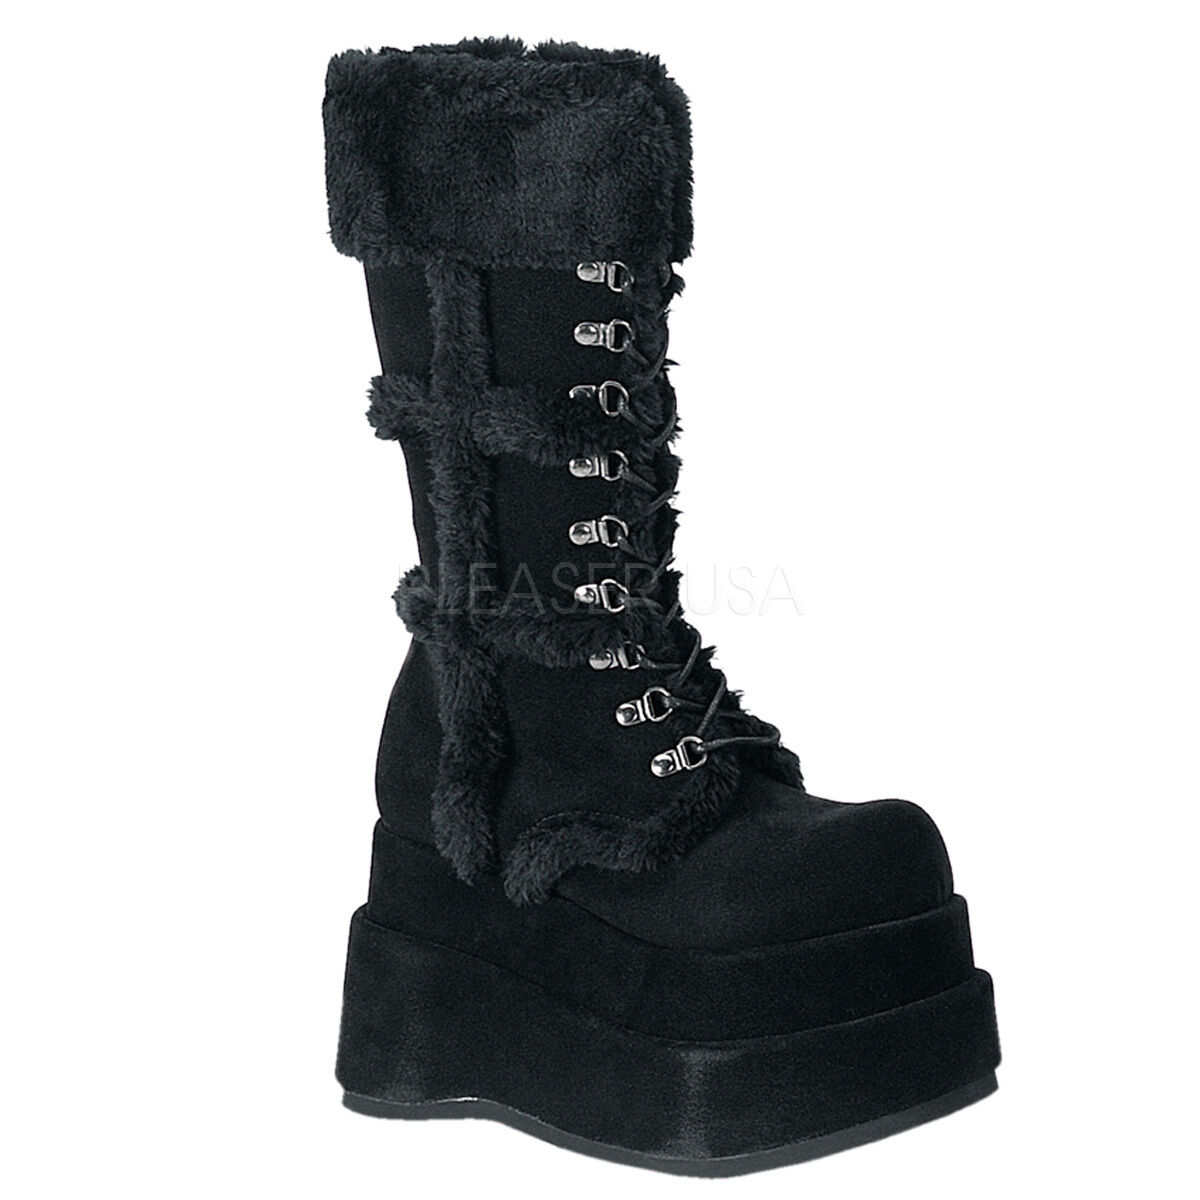 Demonia Bear-202 Gothic Punk Rave Barbarian Cosplay Winter Platform Furry Boots